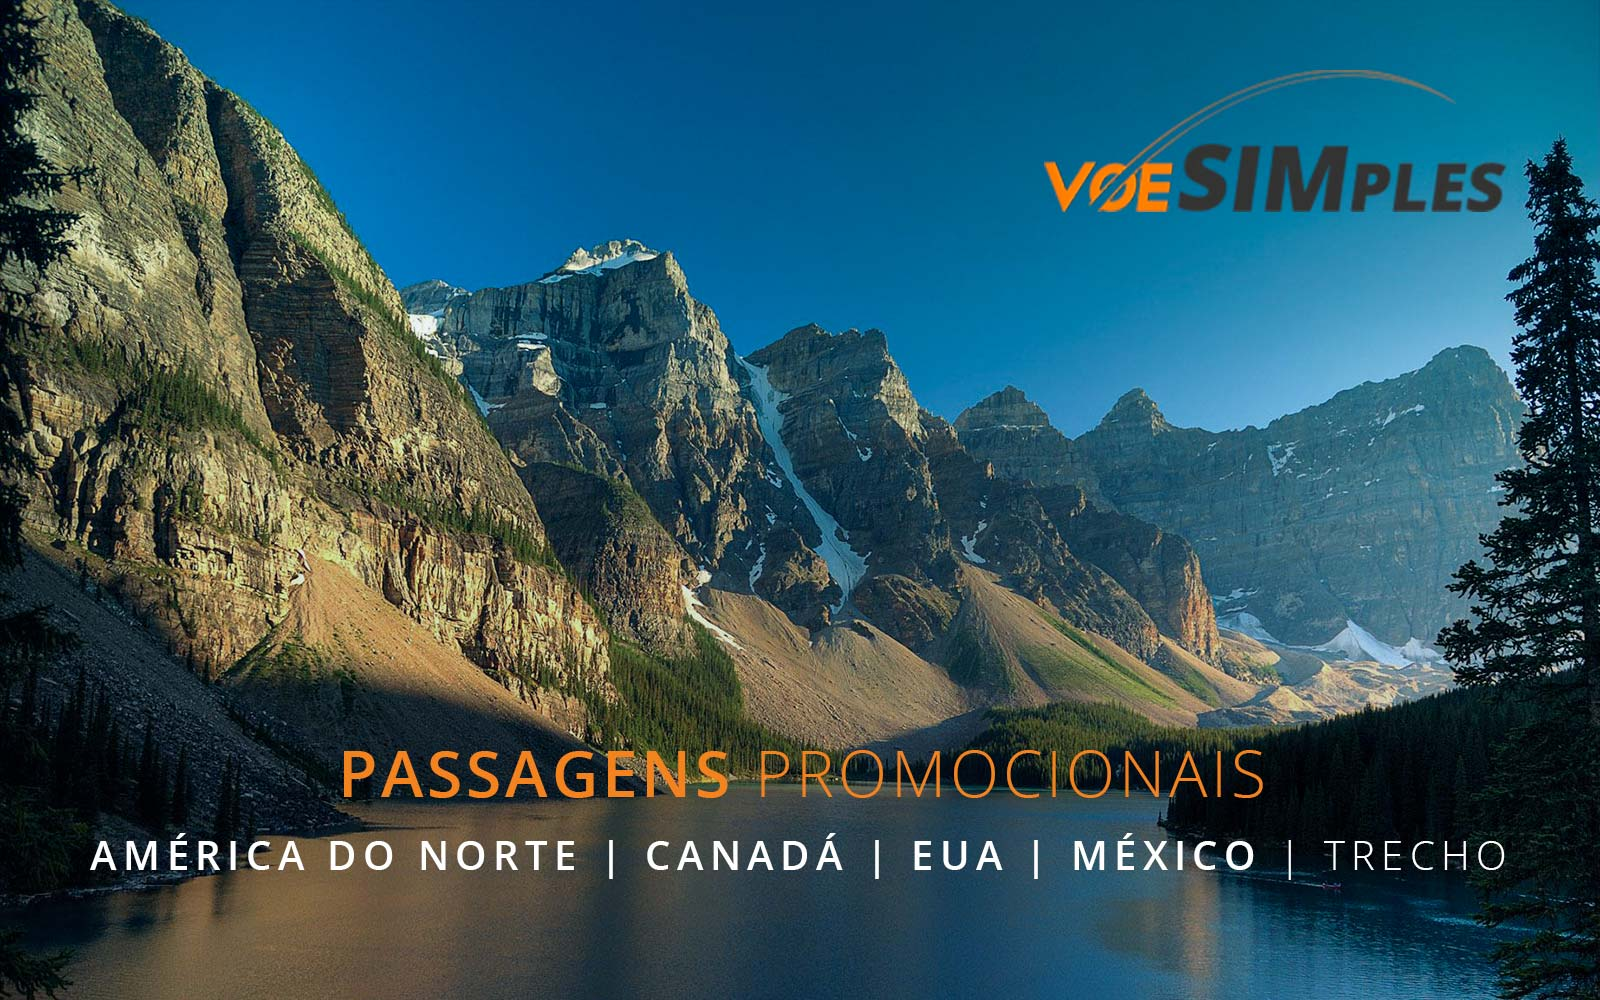 Passagens aéreas promocionais para o Canadá, Estados Unidos e México na América do Norte